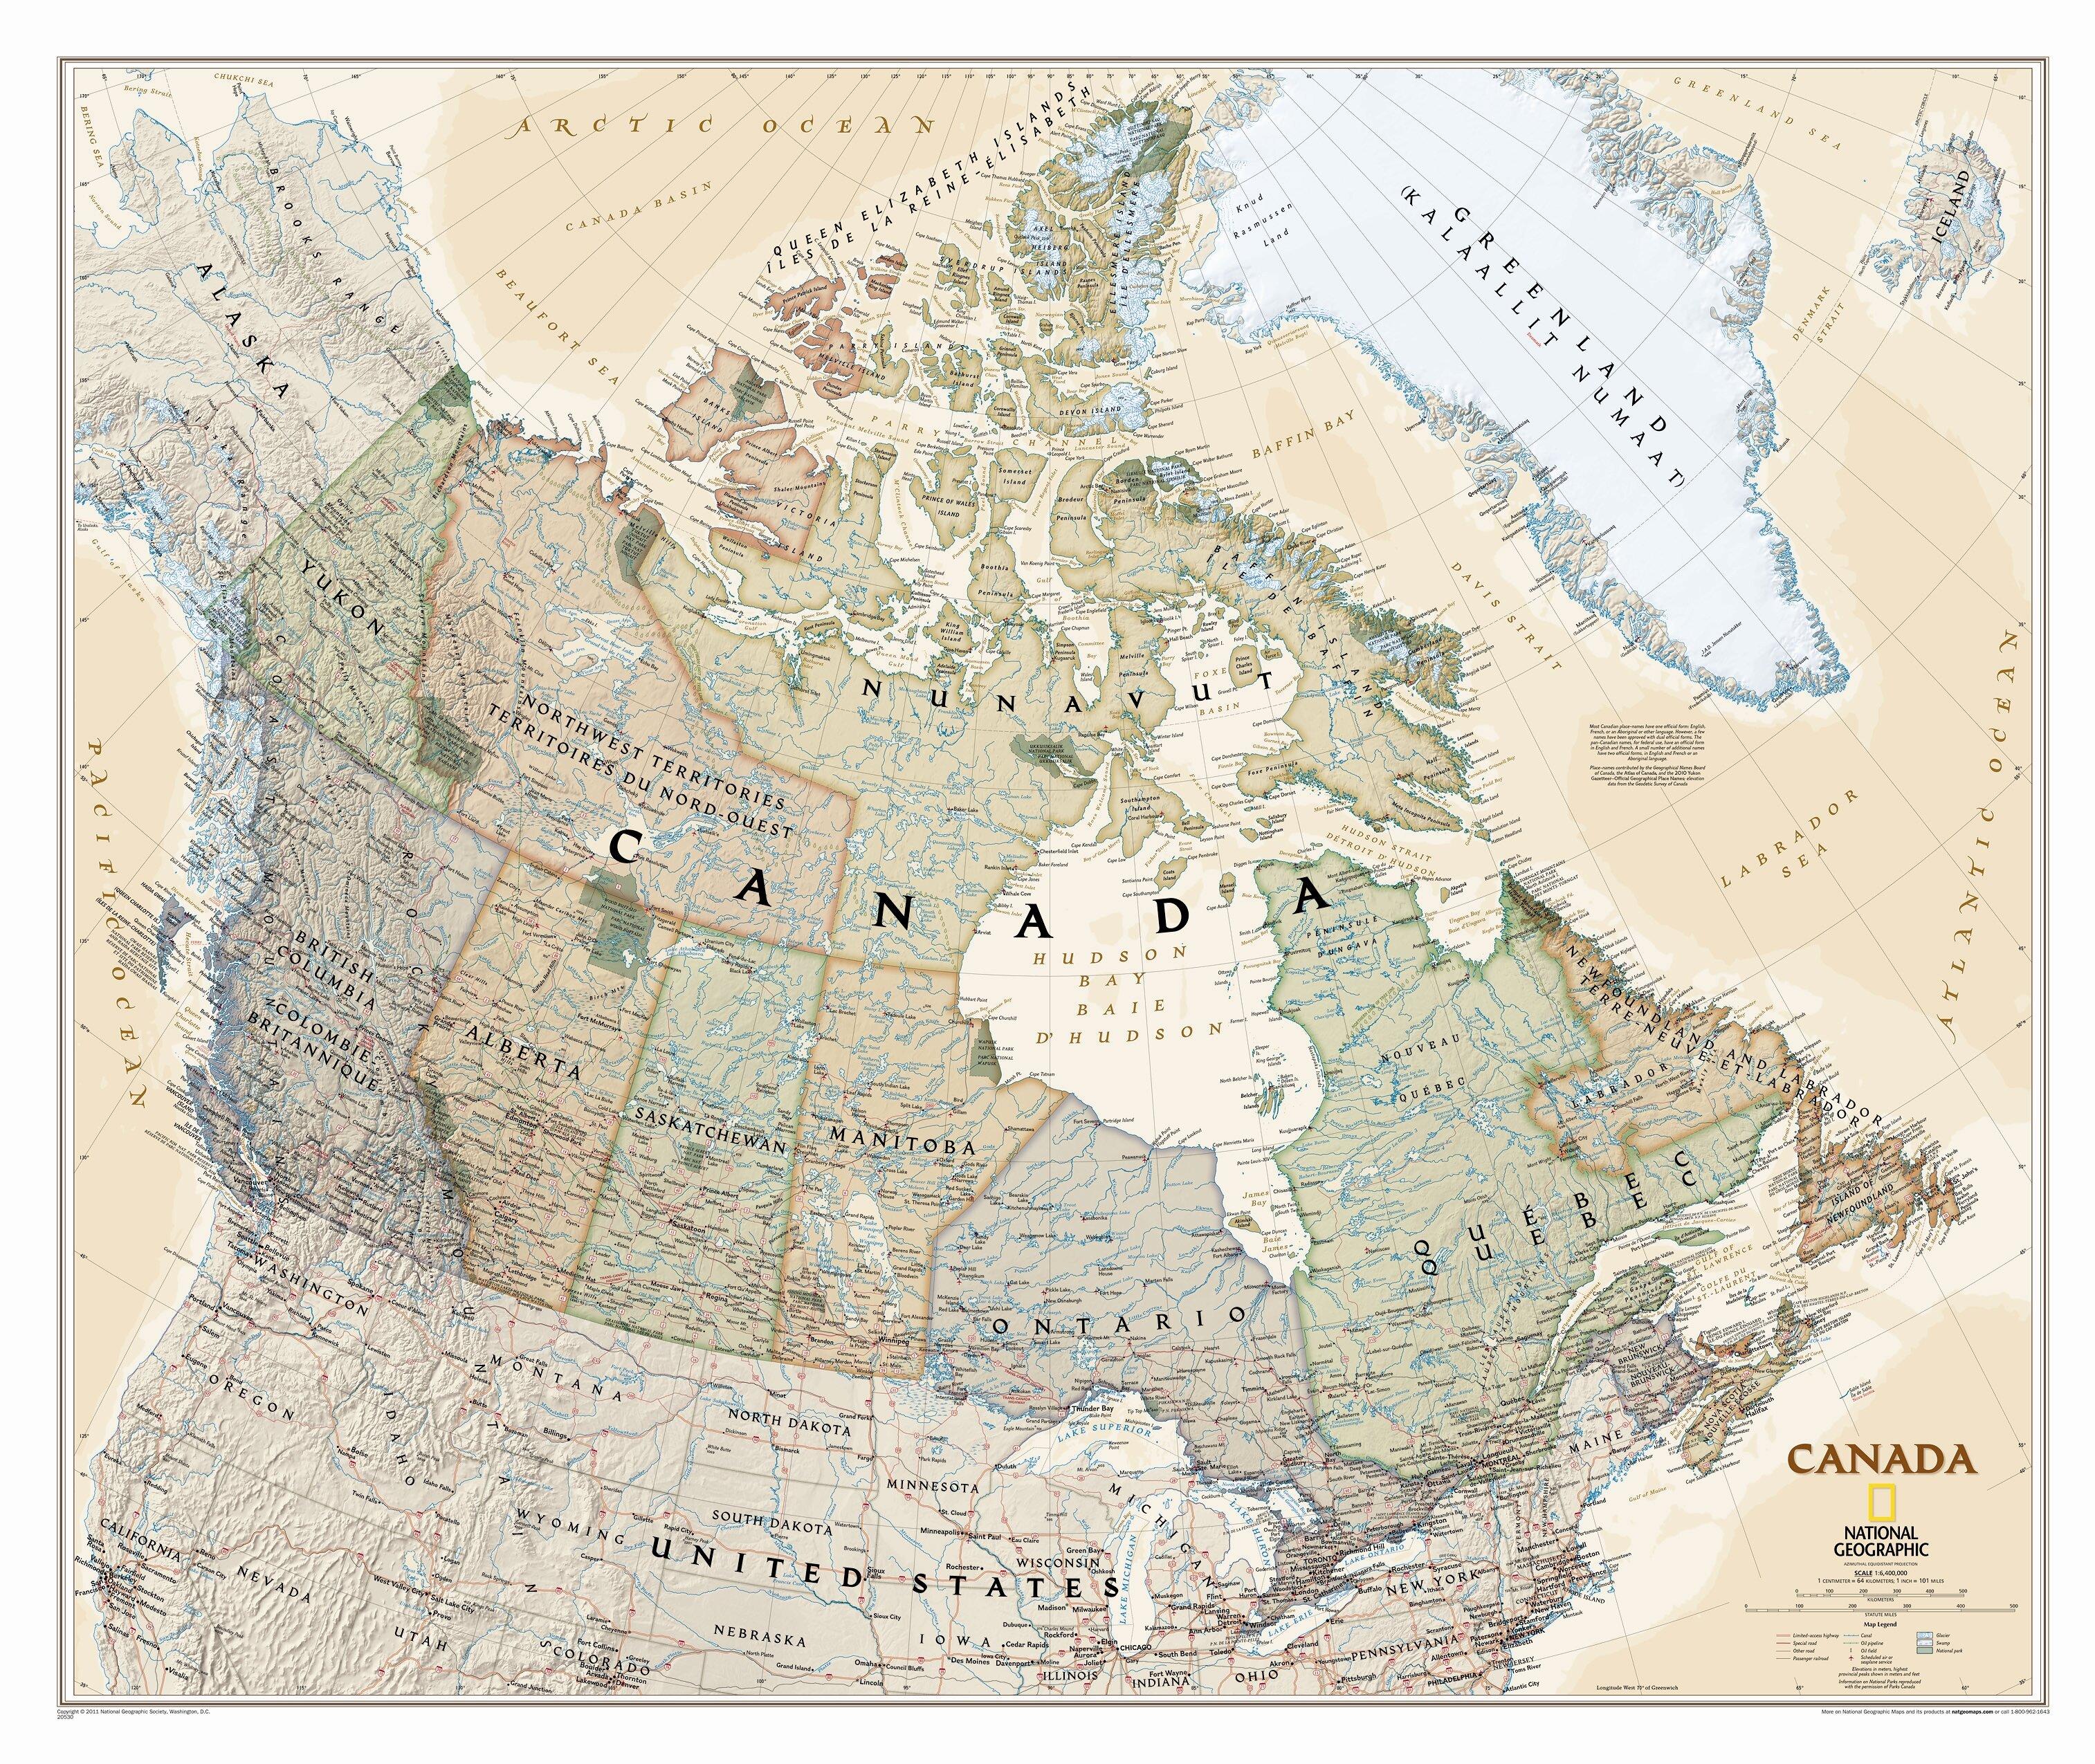 Wall Map Canada National Geographic Maps Canada Executive Wall Map | Wayfair